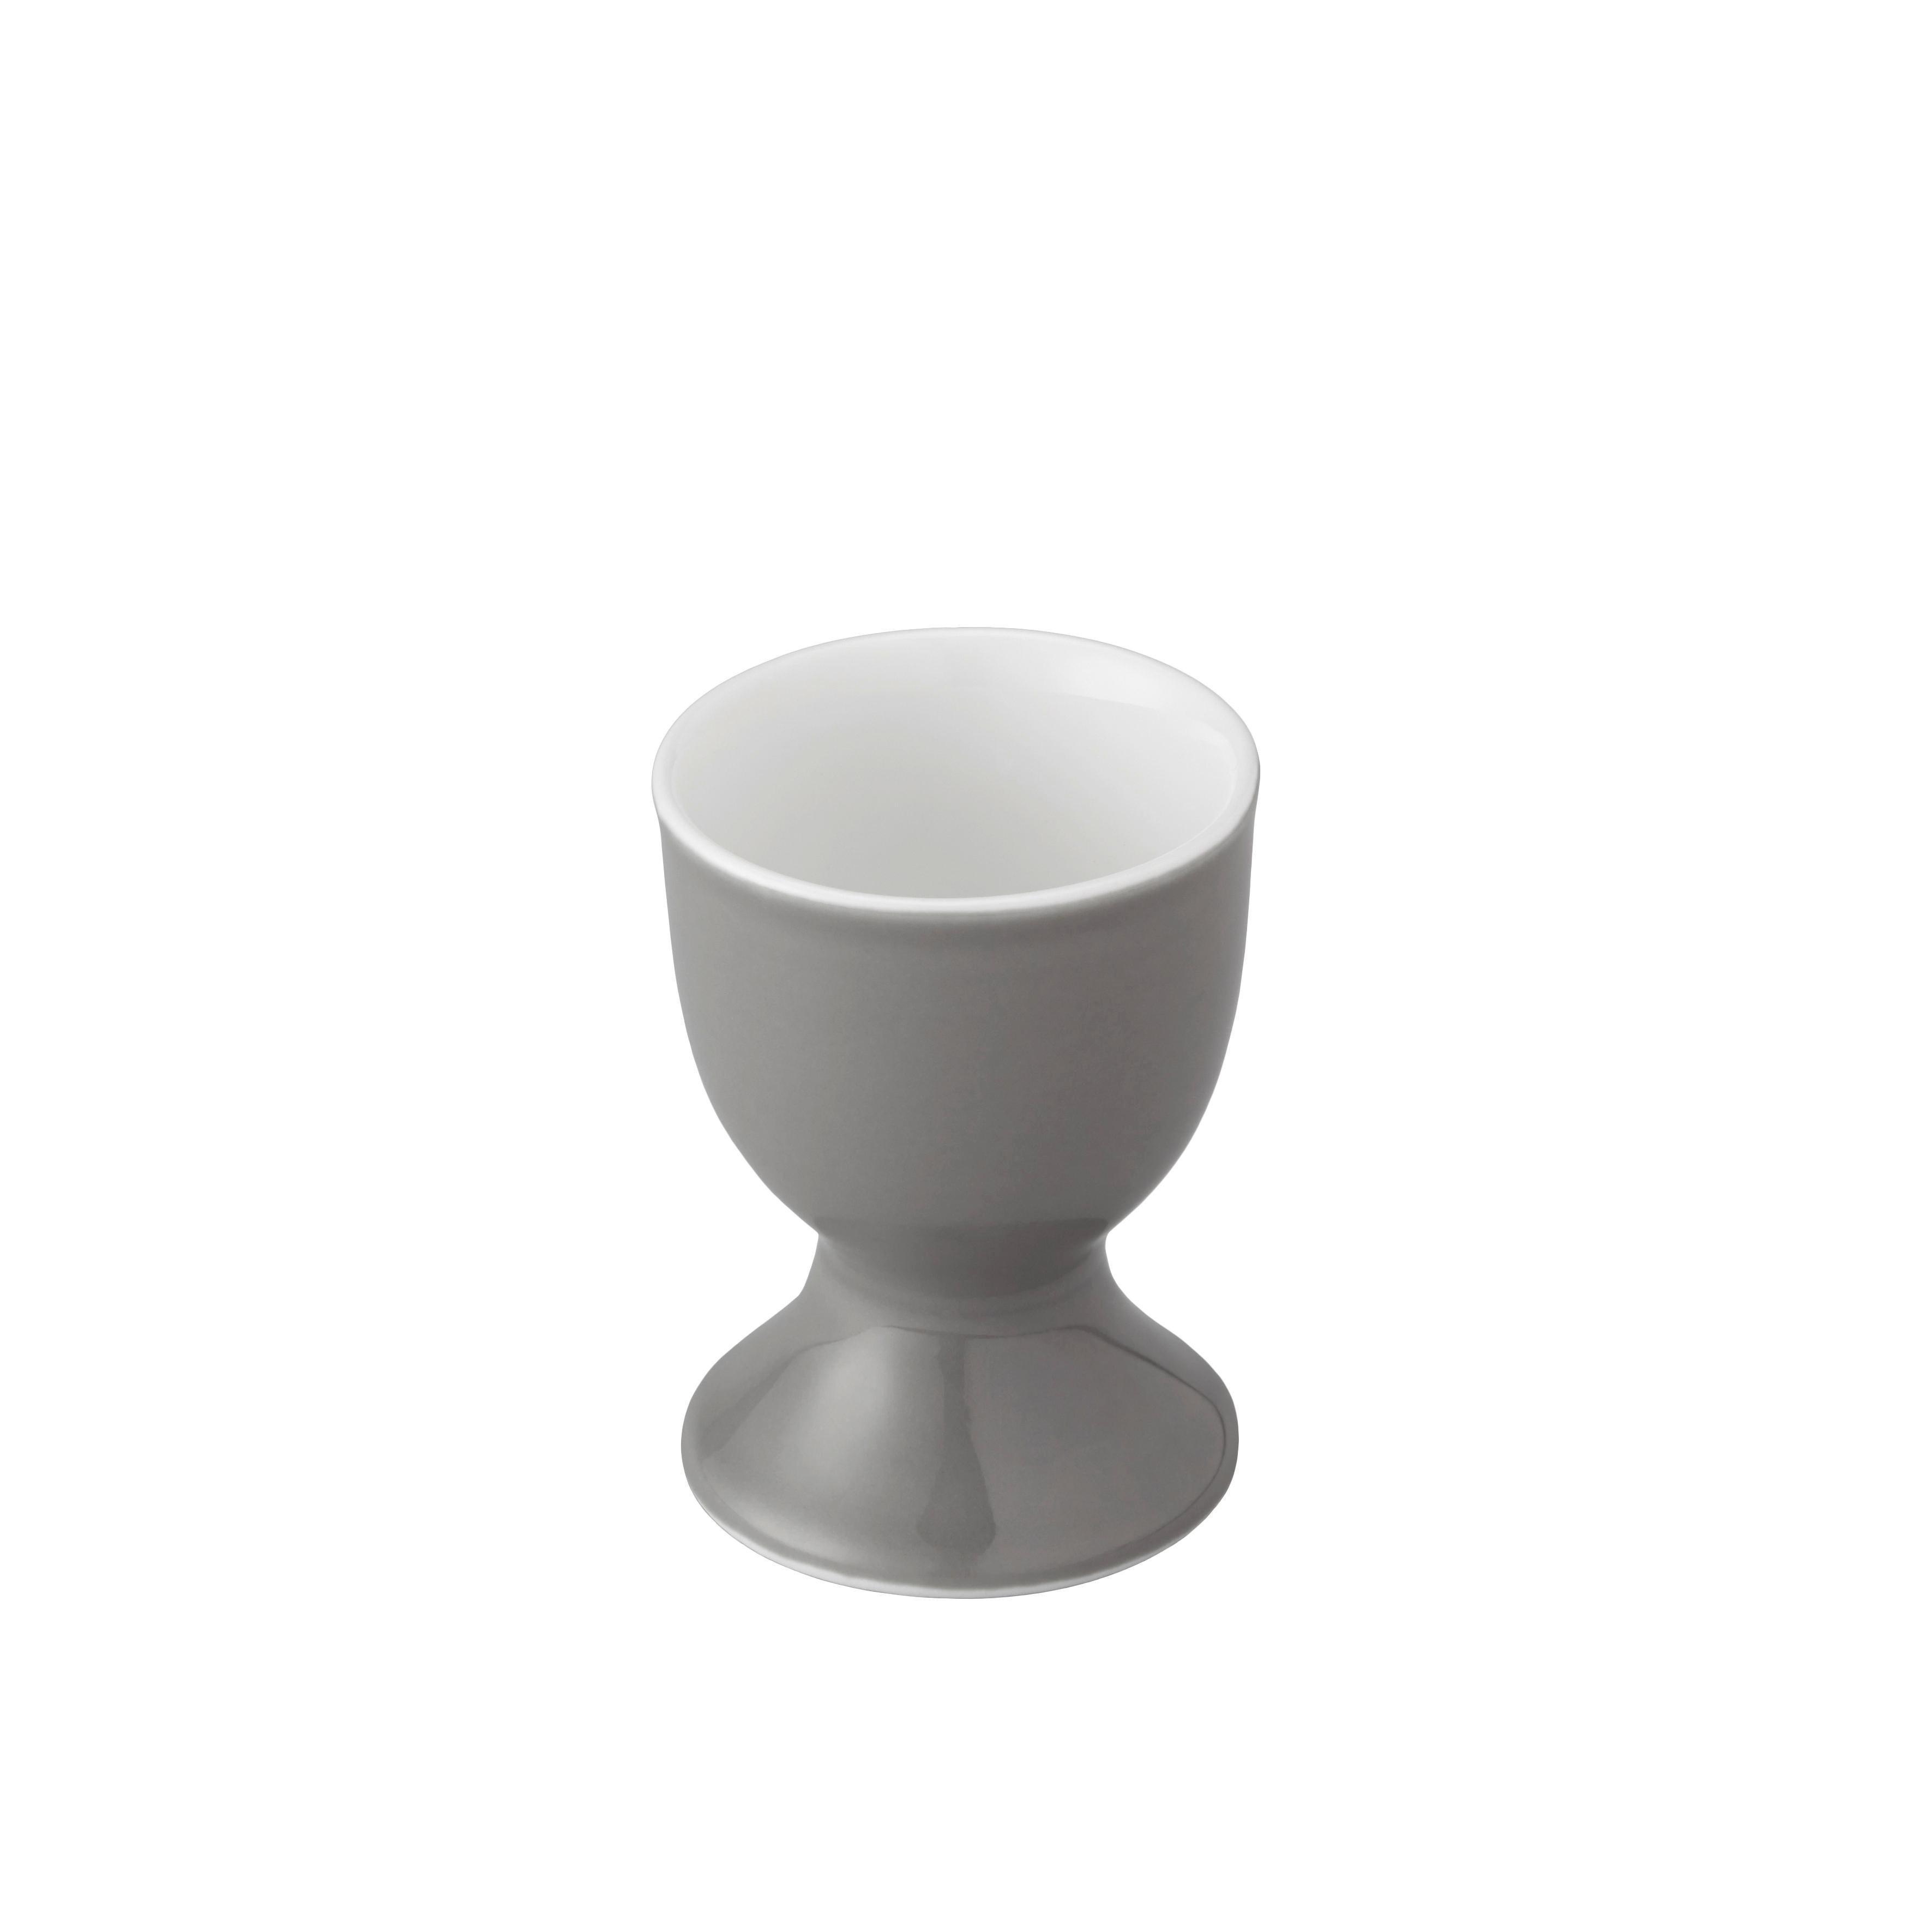 Podstavek Za Jajce Sandy - siva, Konvencionalno, keramika (4,8/6,5cm) - MÖMAX modern living